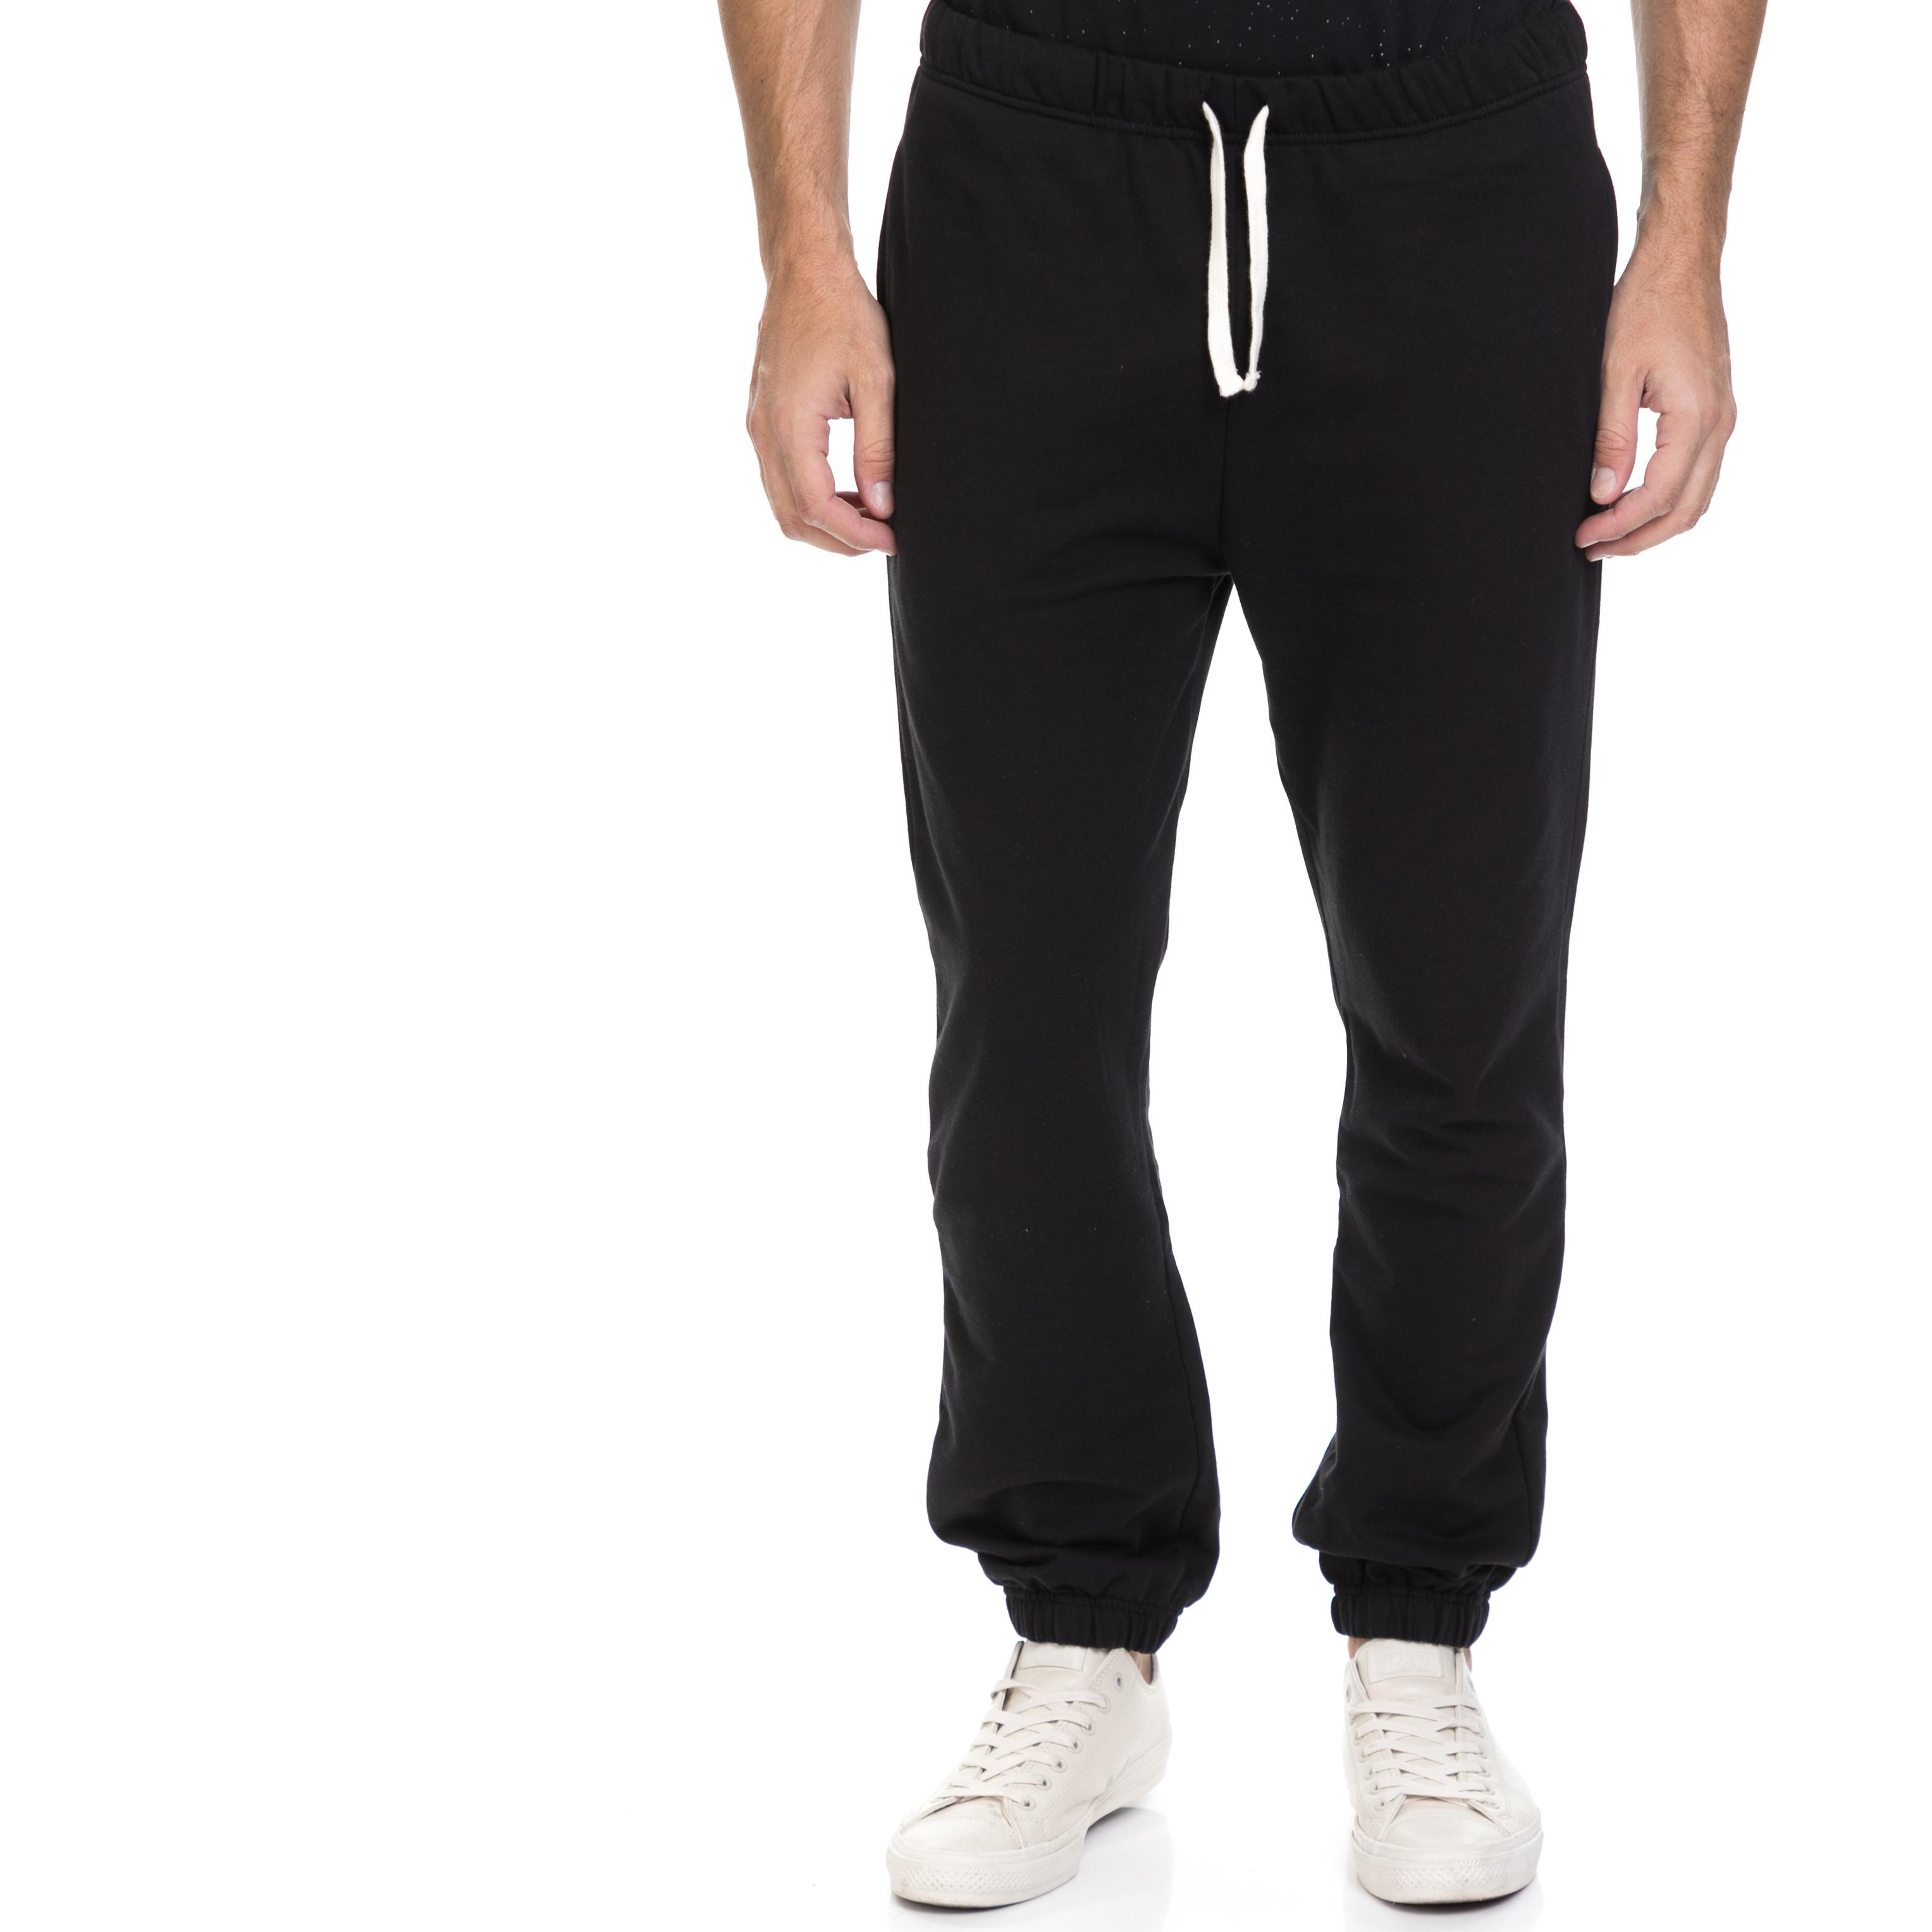 GSA - Ανδρική φόρμα JEPA GSA μαύρη ανδρικά ρούχα αθλητικά φόρμες